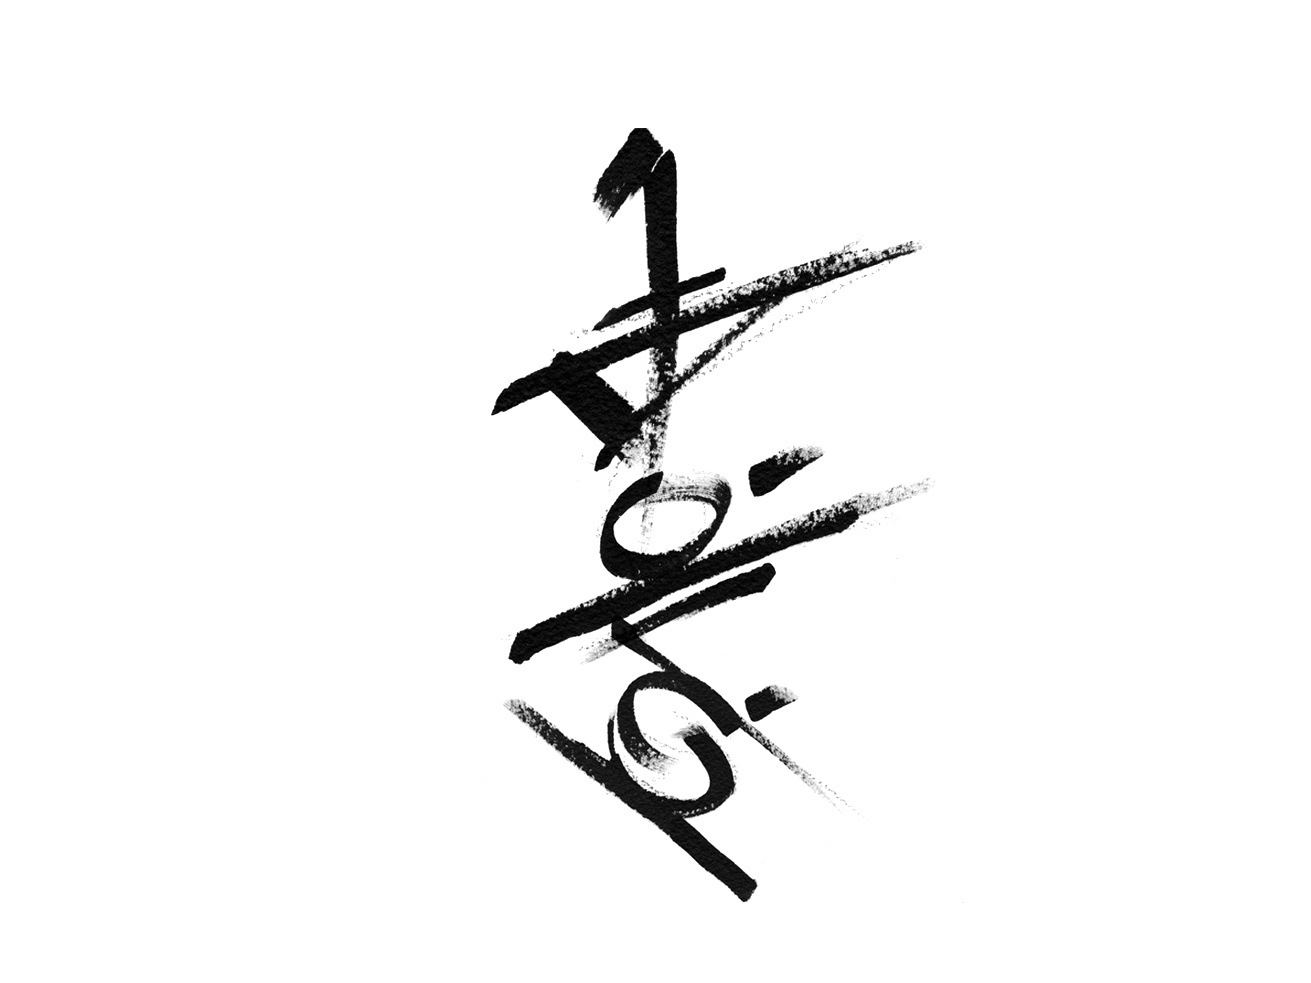 1311x983 E N D Volume Glyph